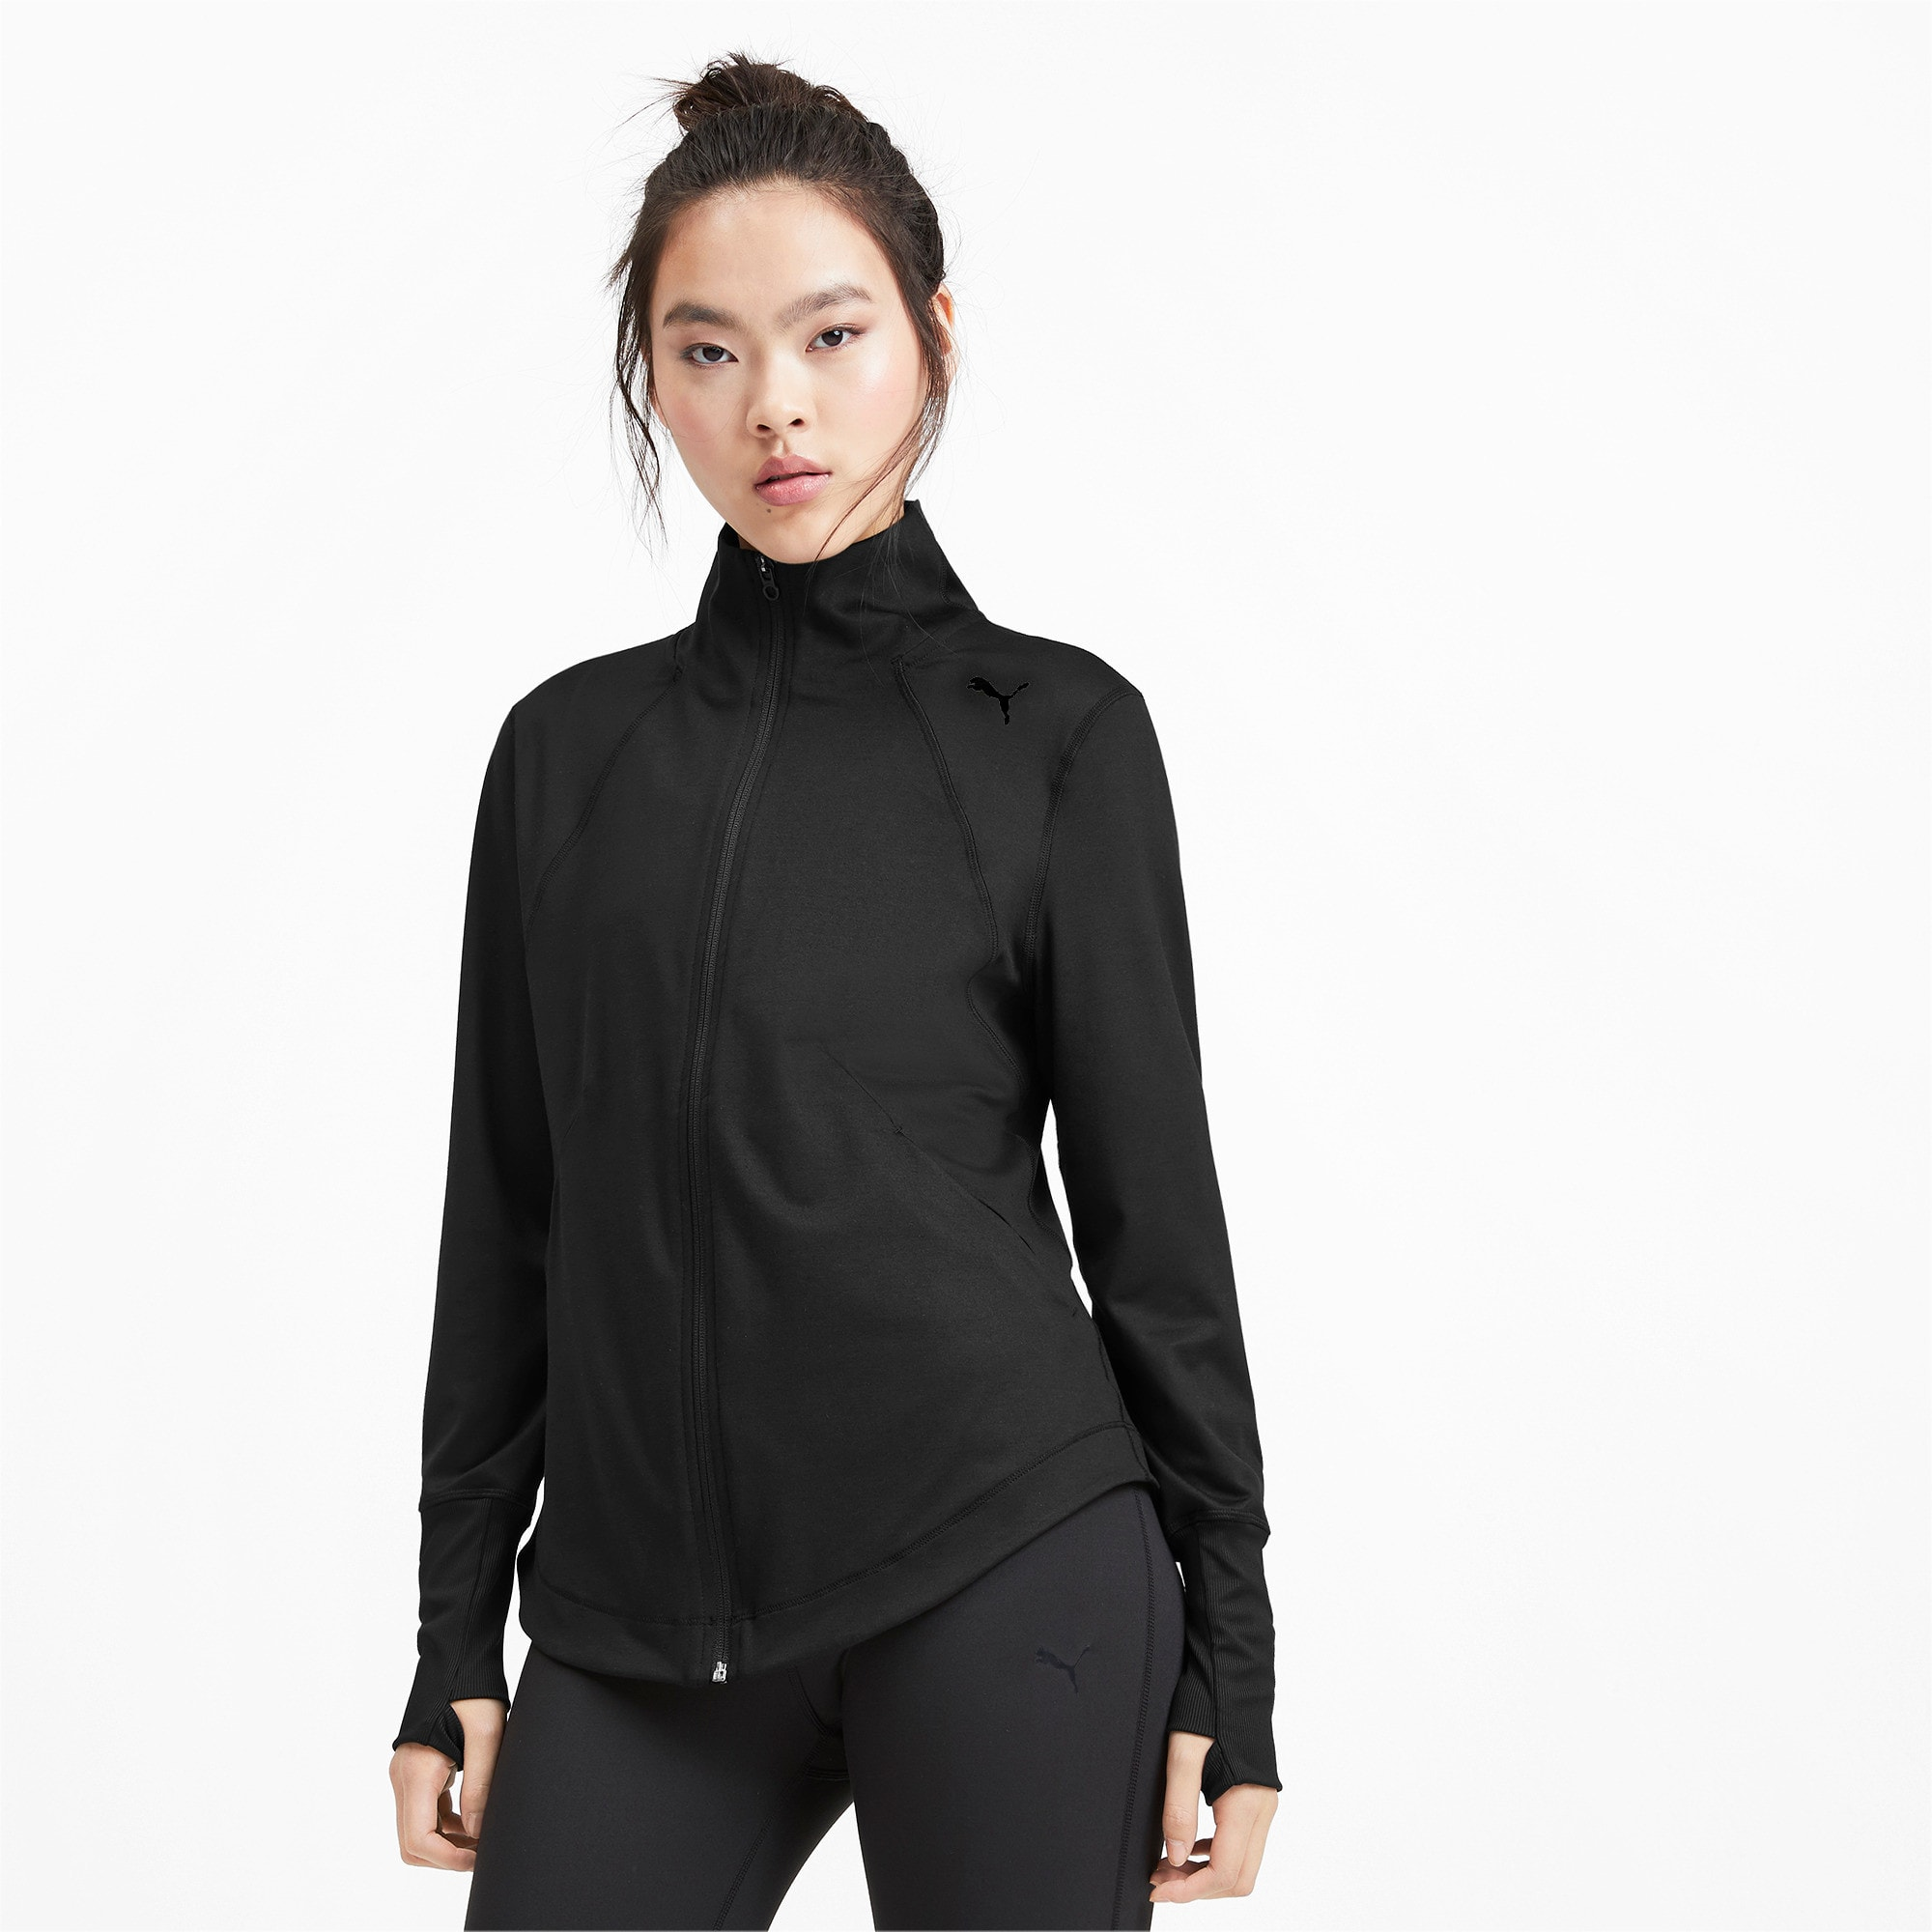 Thumbnail 1 of Studio Knit Women's Training Jacket, Puma Black, medium-IND